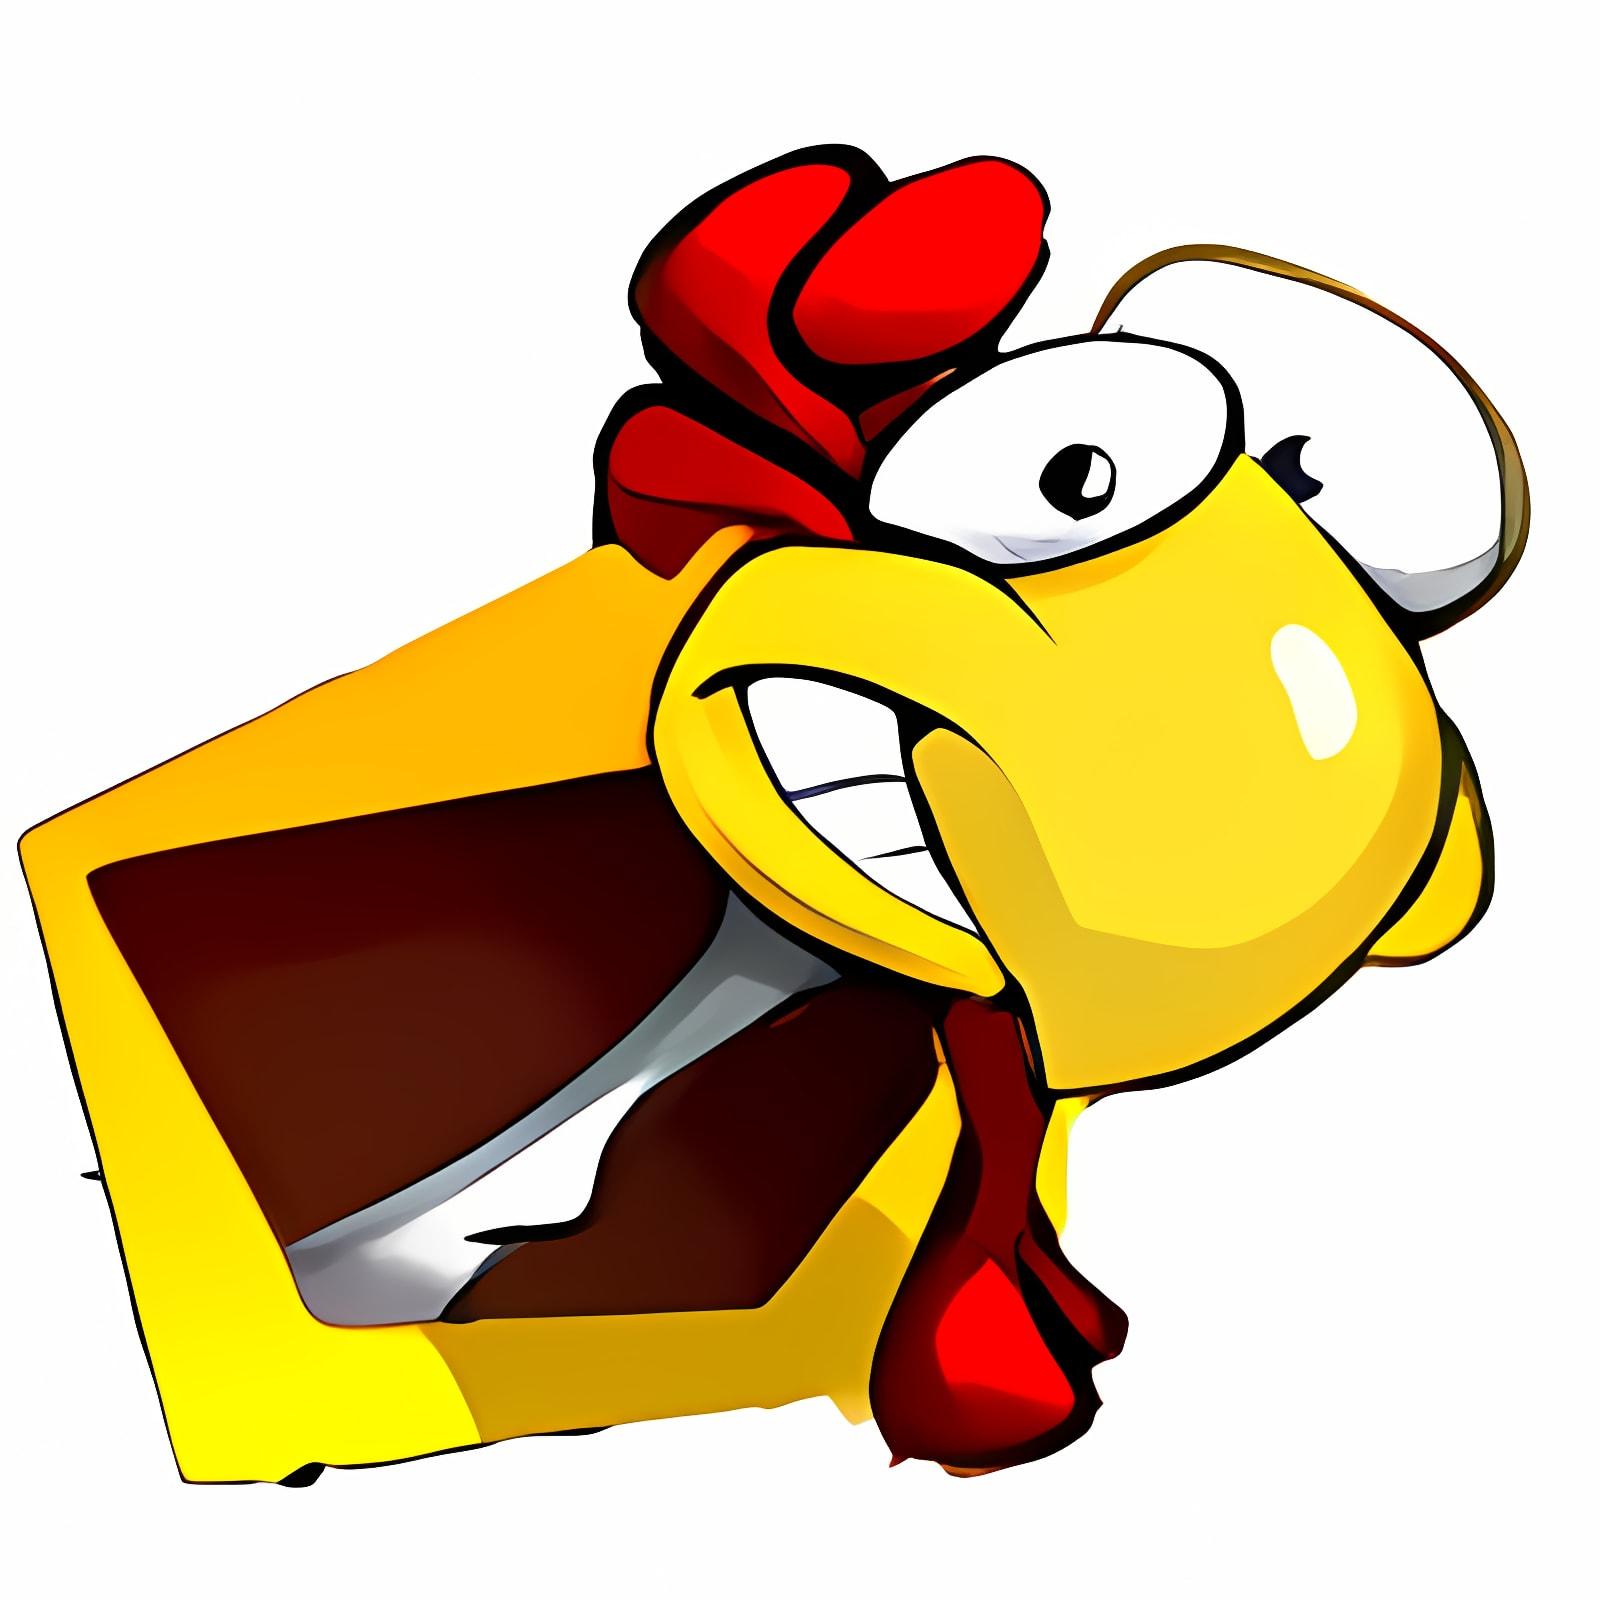 Hühner-Rache